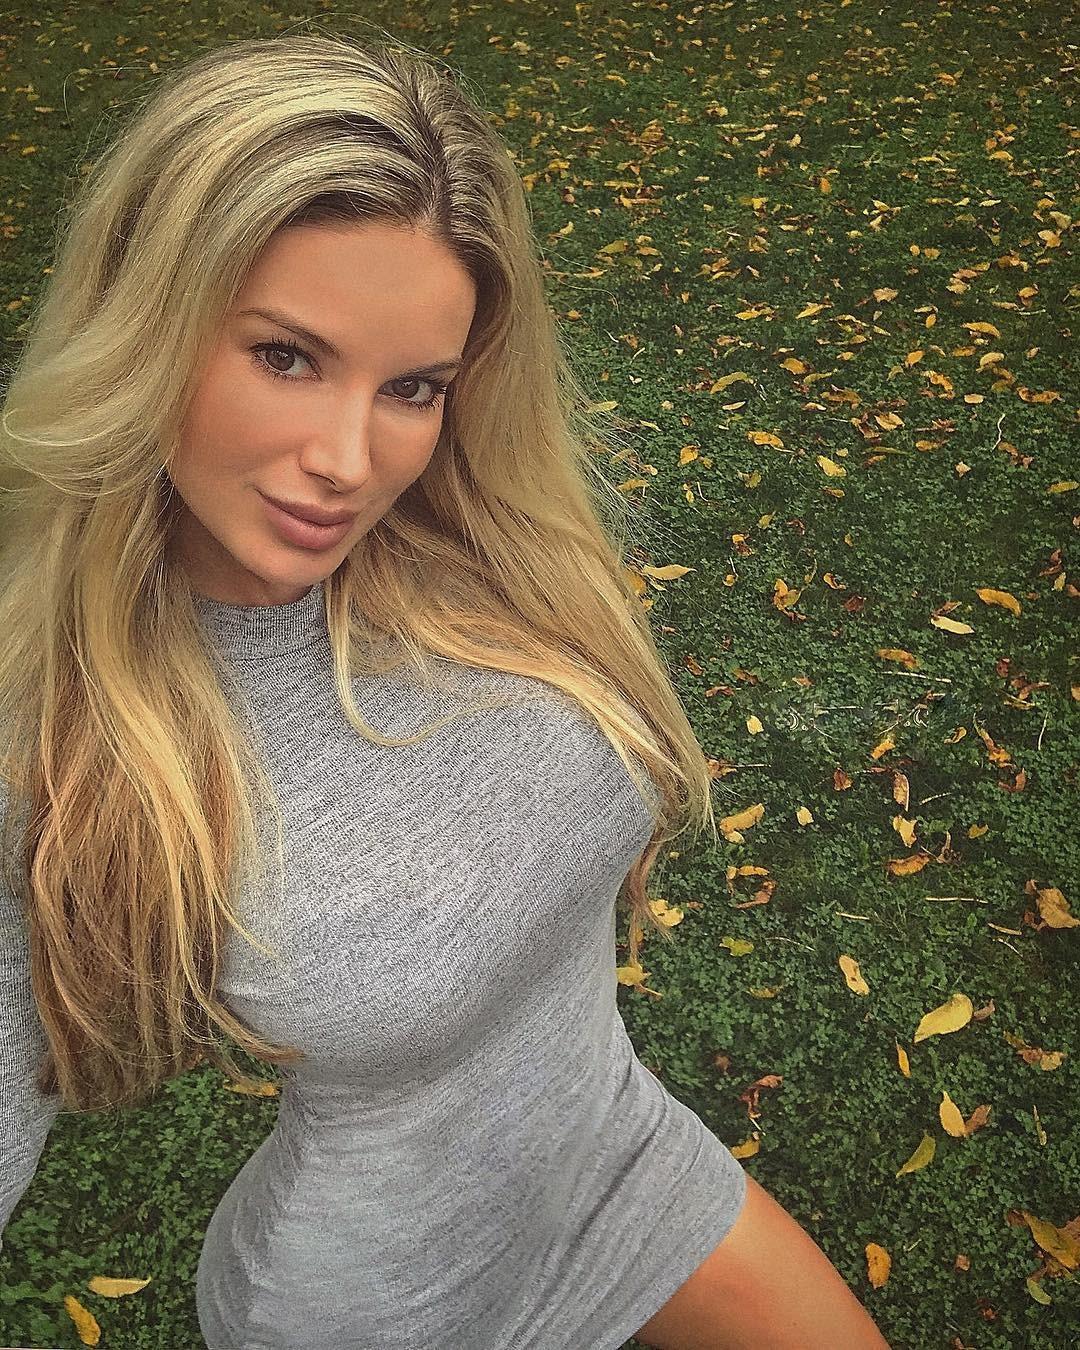 Natalie Gauvreau, Model, Toronto, Ontario, Canada